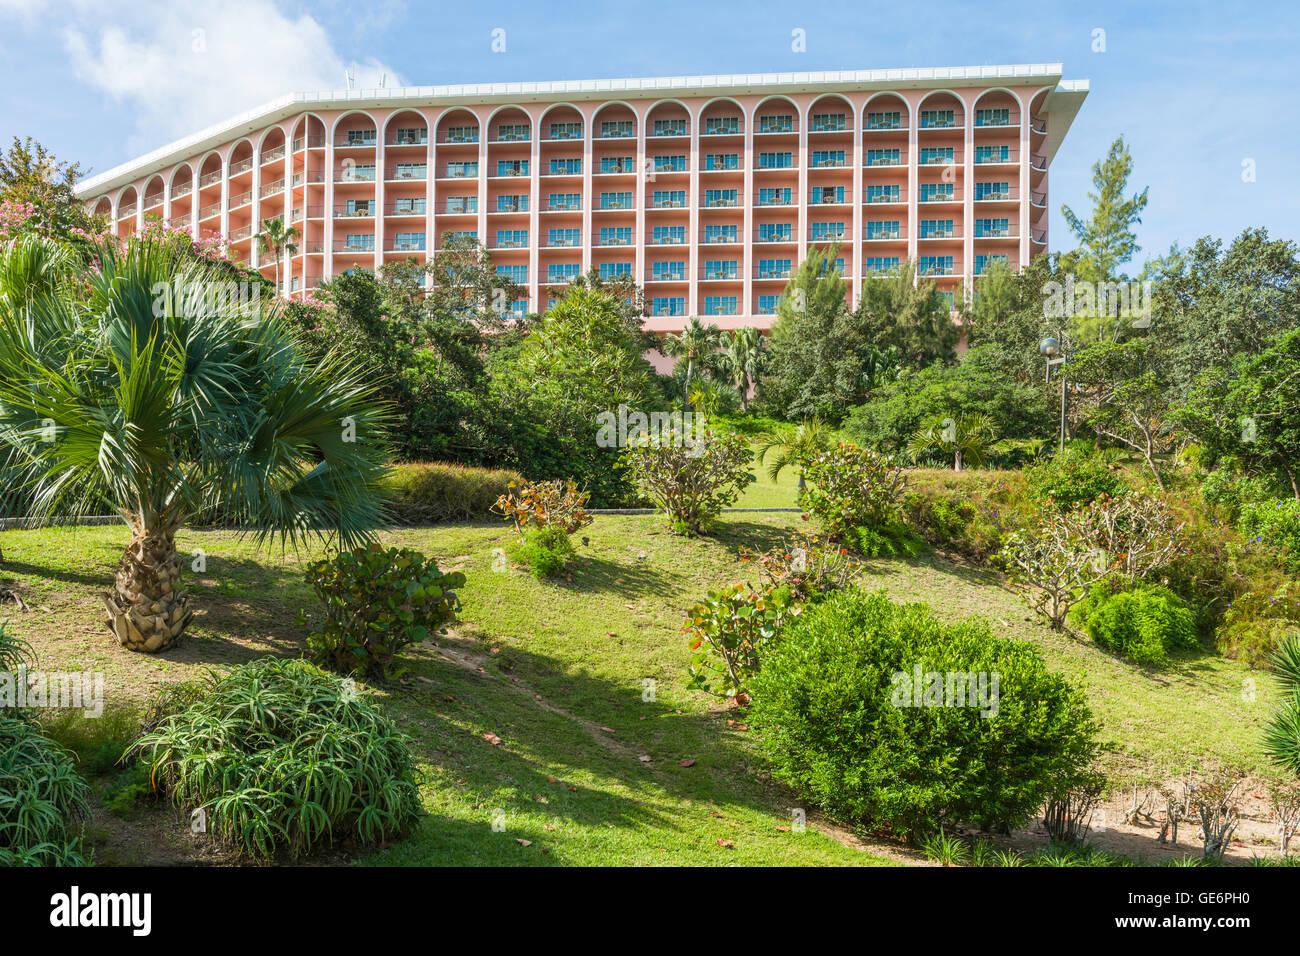 The Fairmont Southampton luxury resort at Southampton, Bermuda - Stock Image